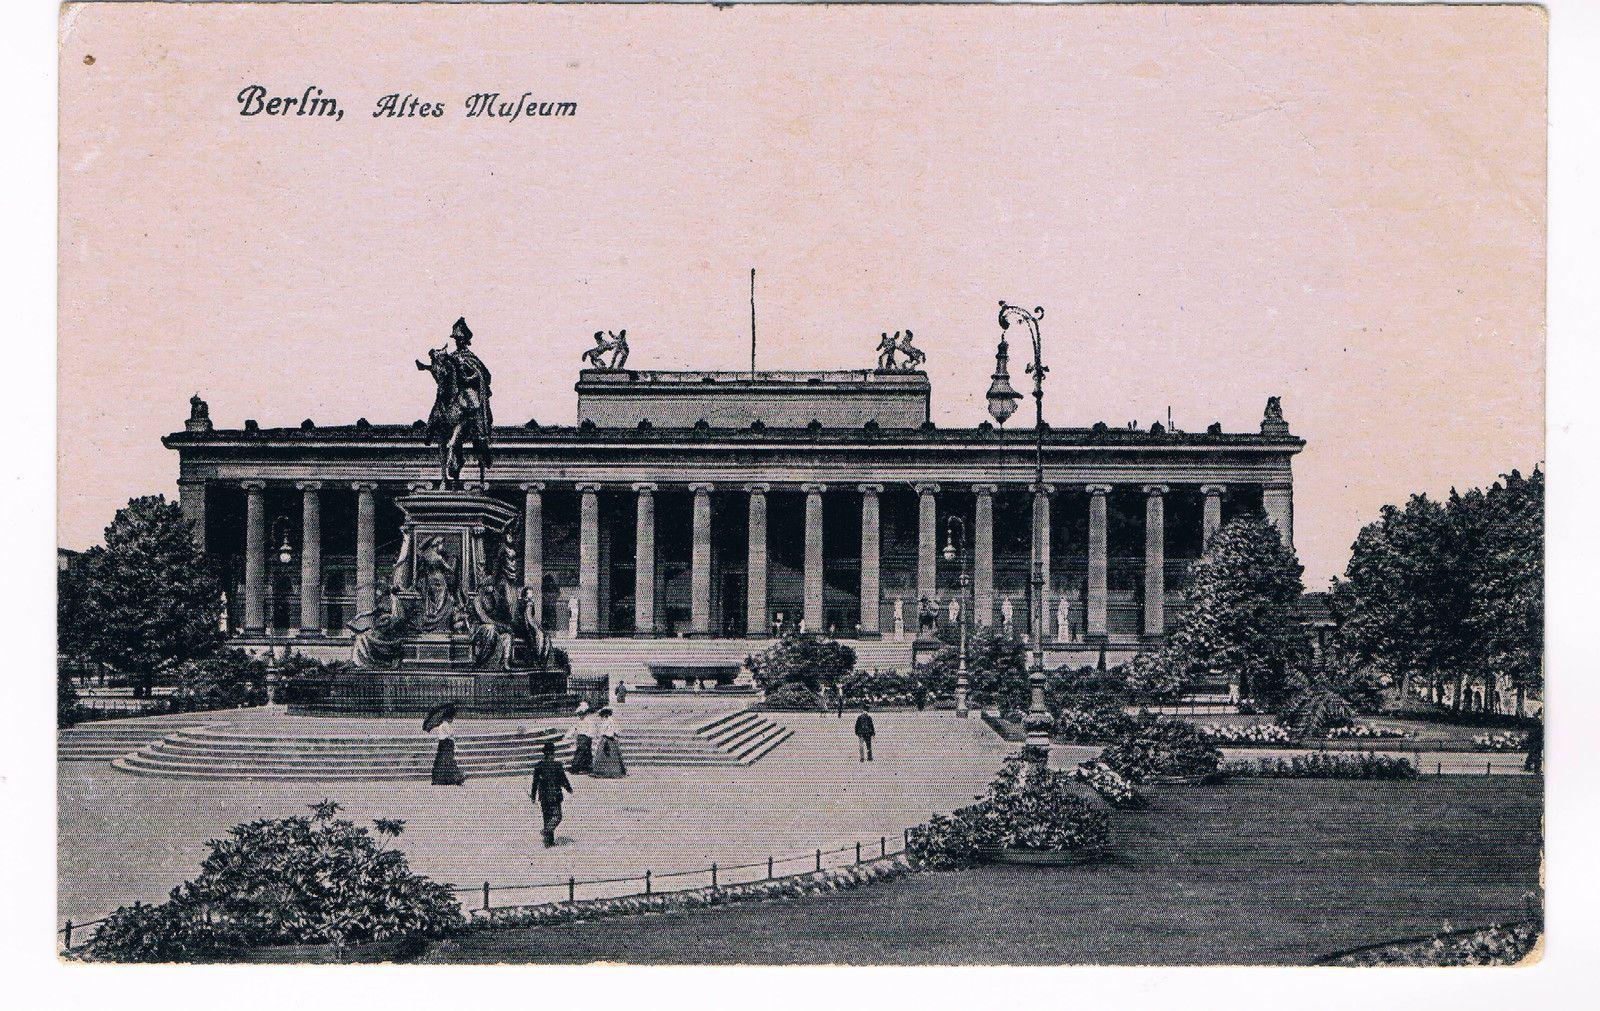 Ansichtskarte Berlin Altes Museum 1 Wk Feldpoststempel Berlin 24 5 16 Ebay Altes Museum Museum Insel Historische Fotos